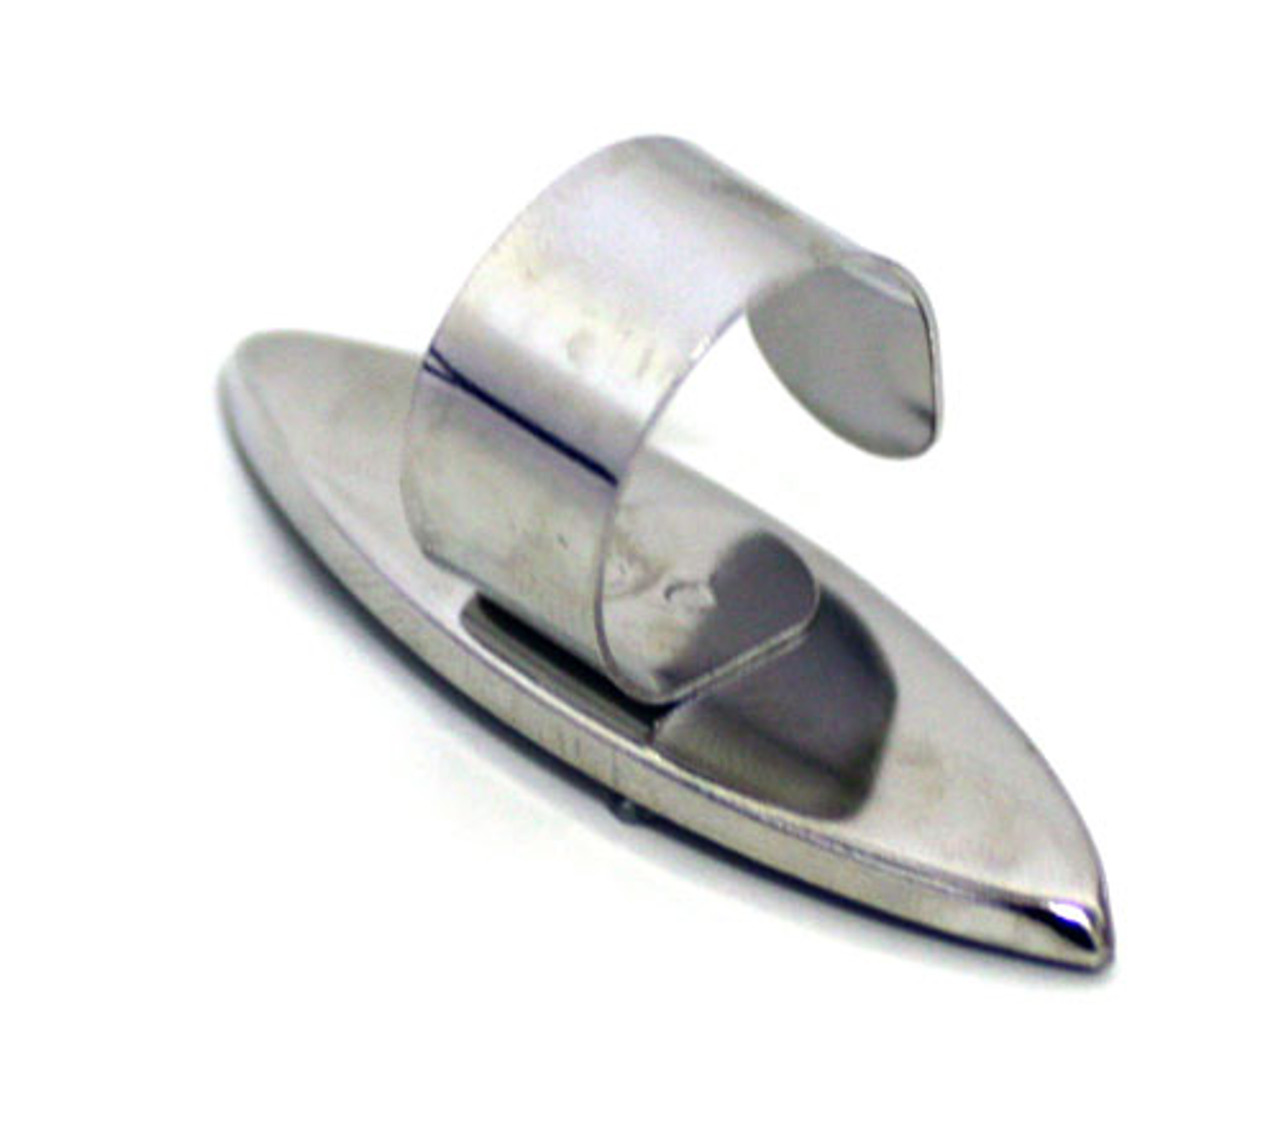 Efcolor Ring Bezel Blank - Pointed Oval - 17 x 52mm